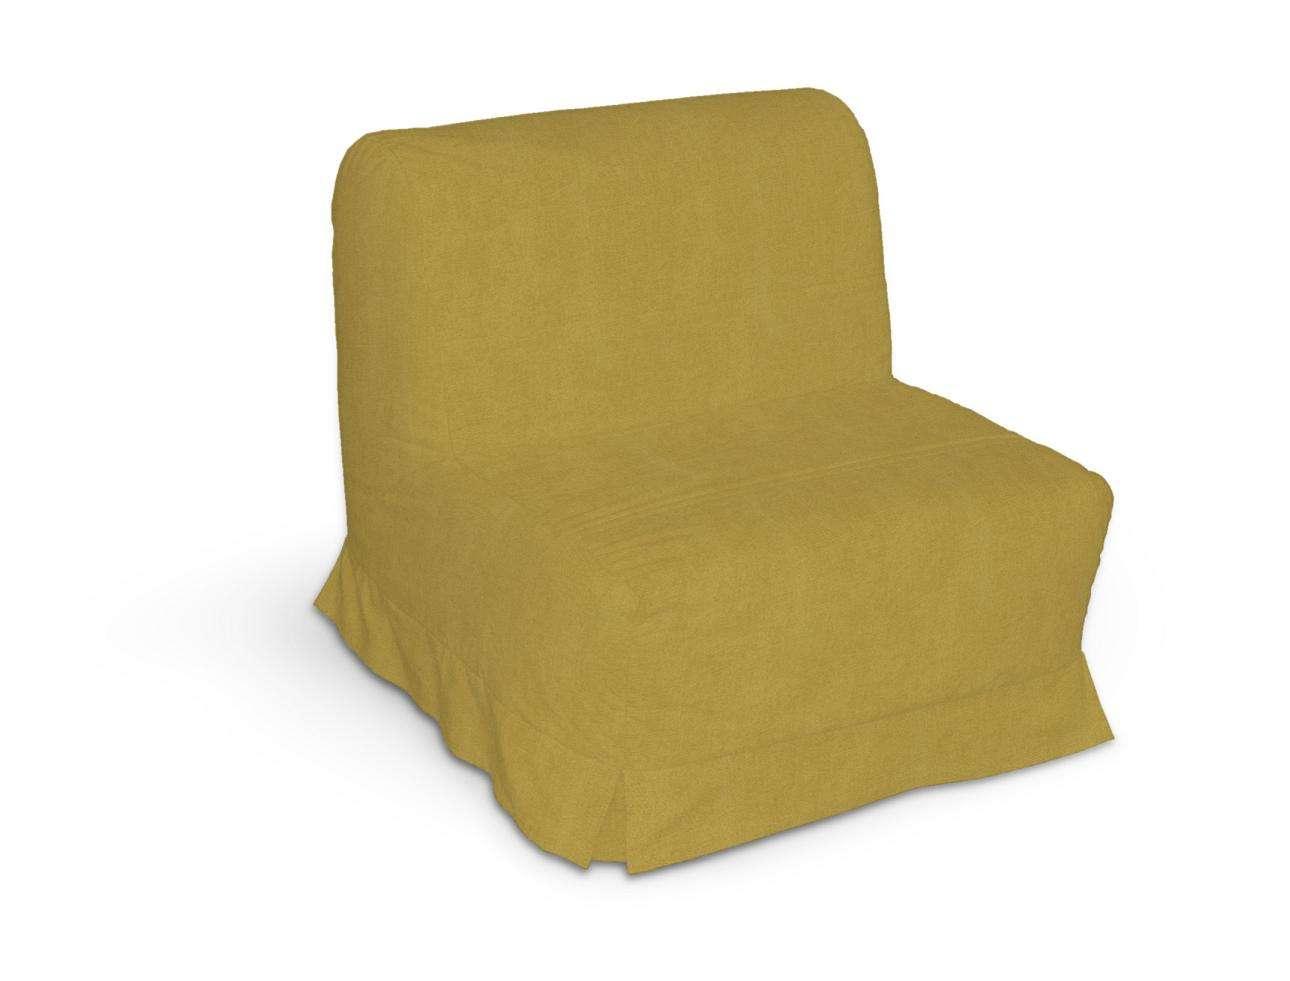 Lycksele Sesselbezug mit Kellerfalten Lycksele von der Kollektion Etna, Stoff: 705-04